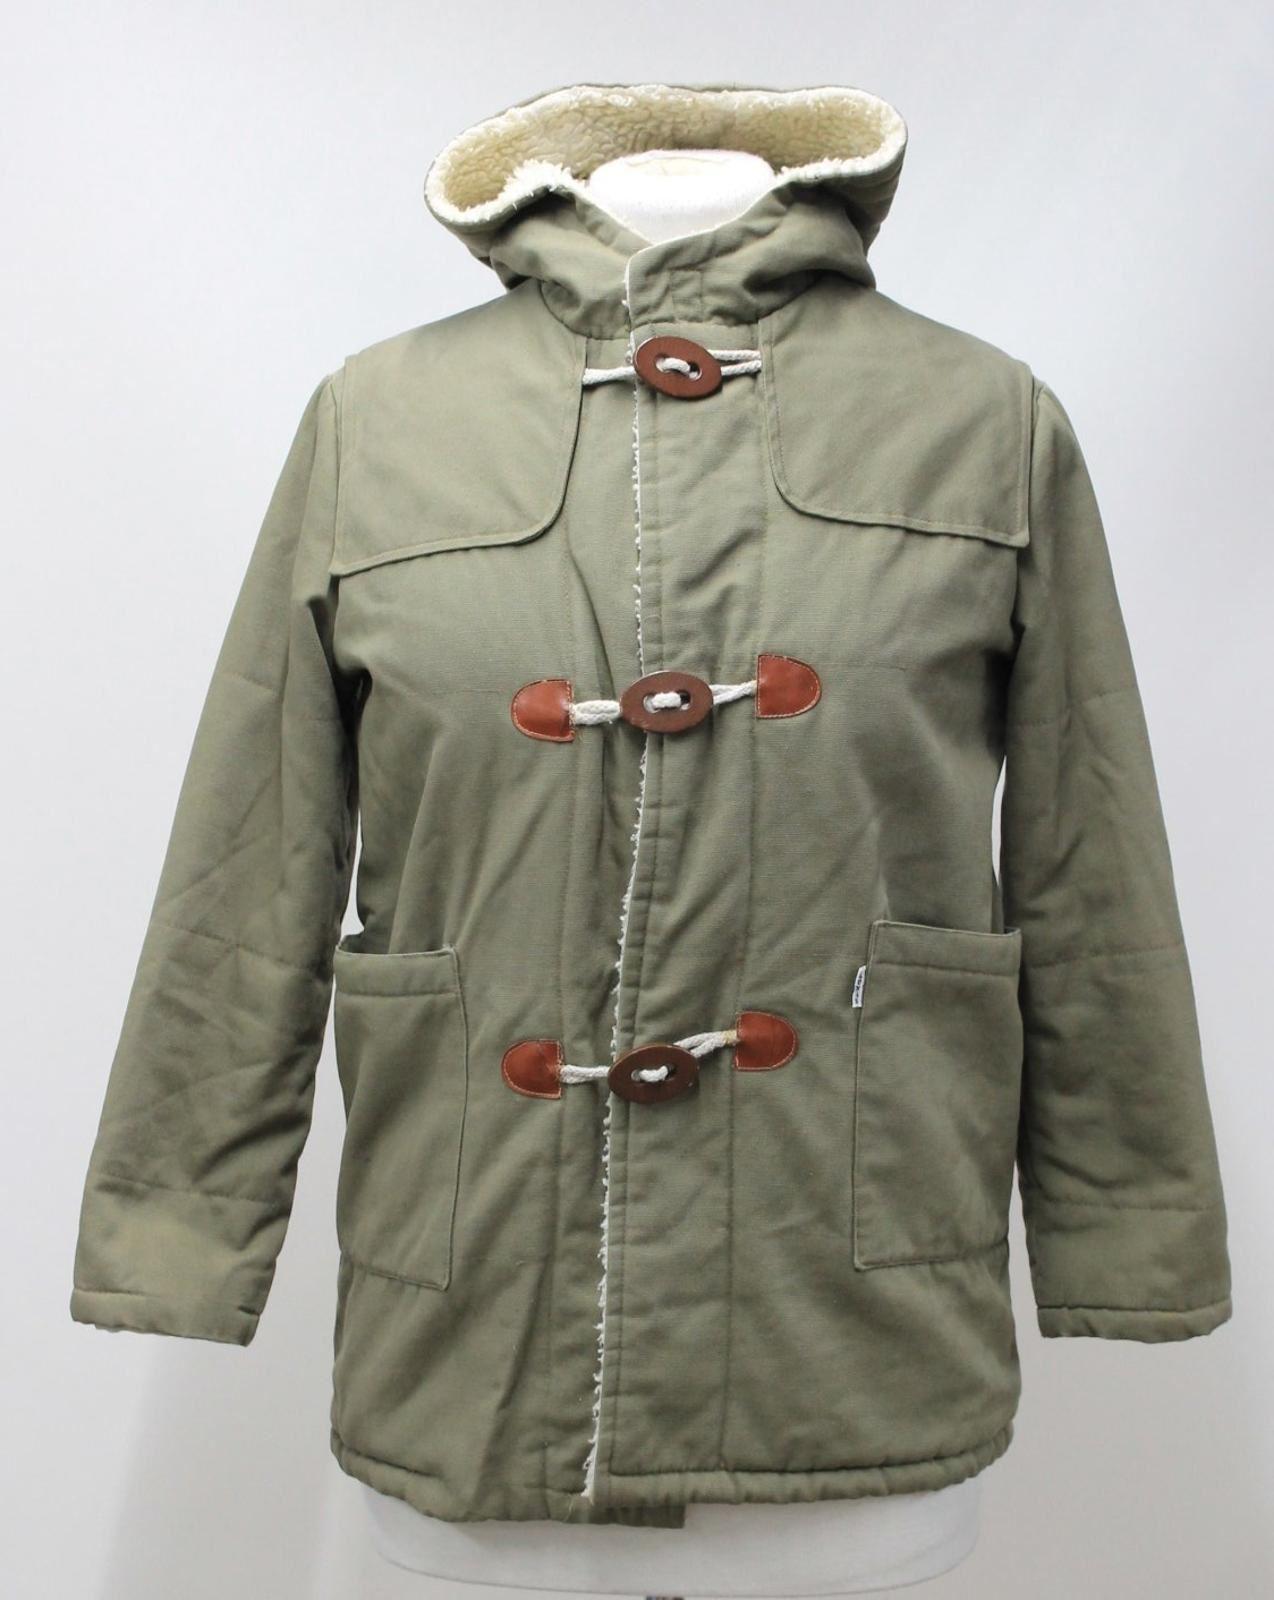 Size 16 Ladies New Fuchsia Fleece Duffle Style Hooded Parka Coat Jacket Parker